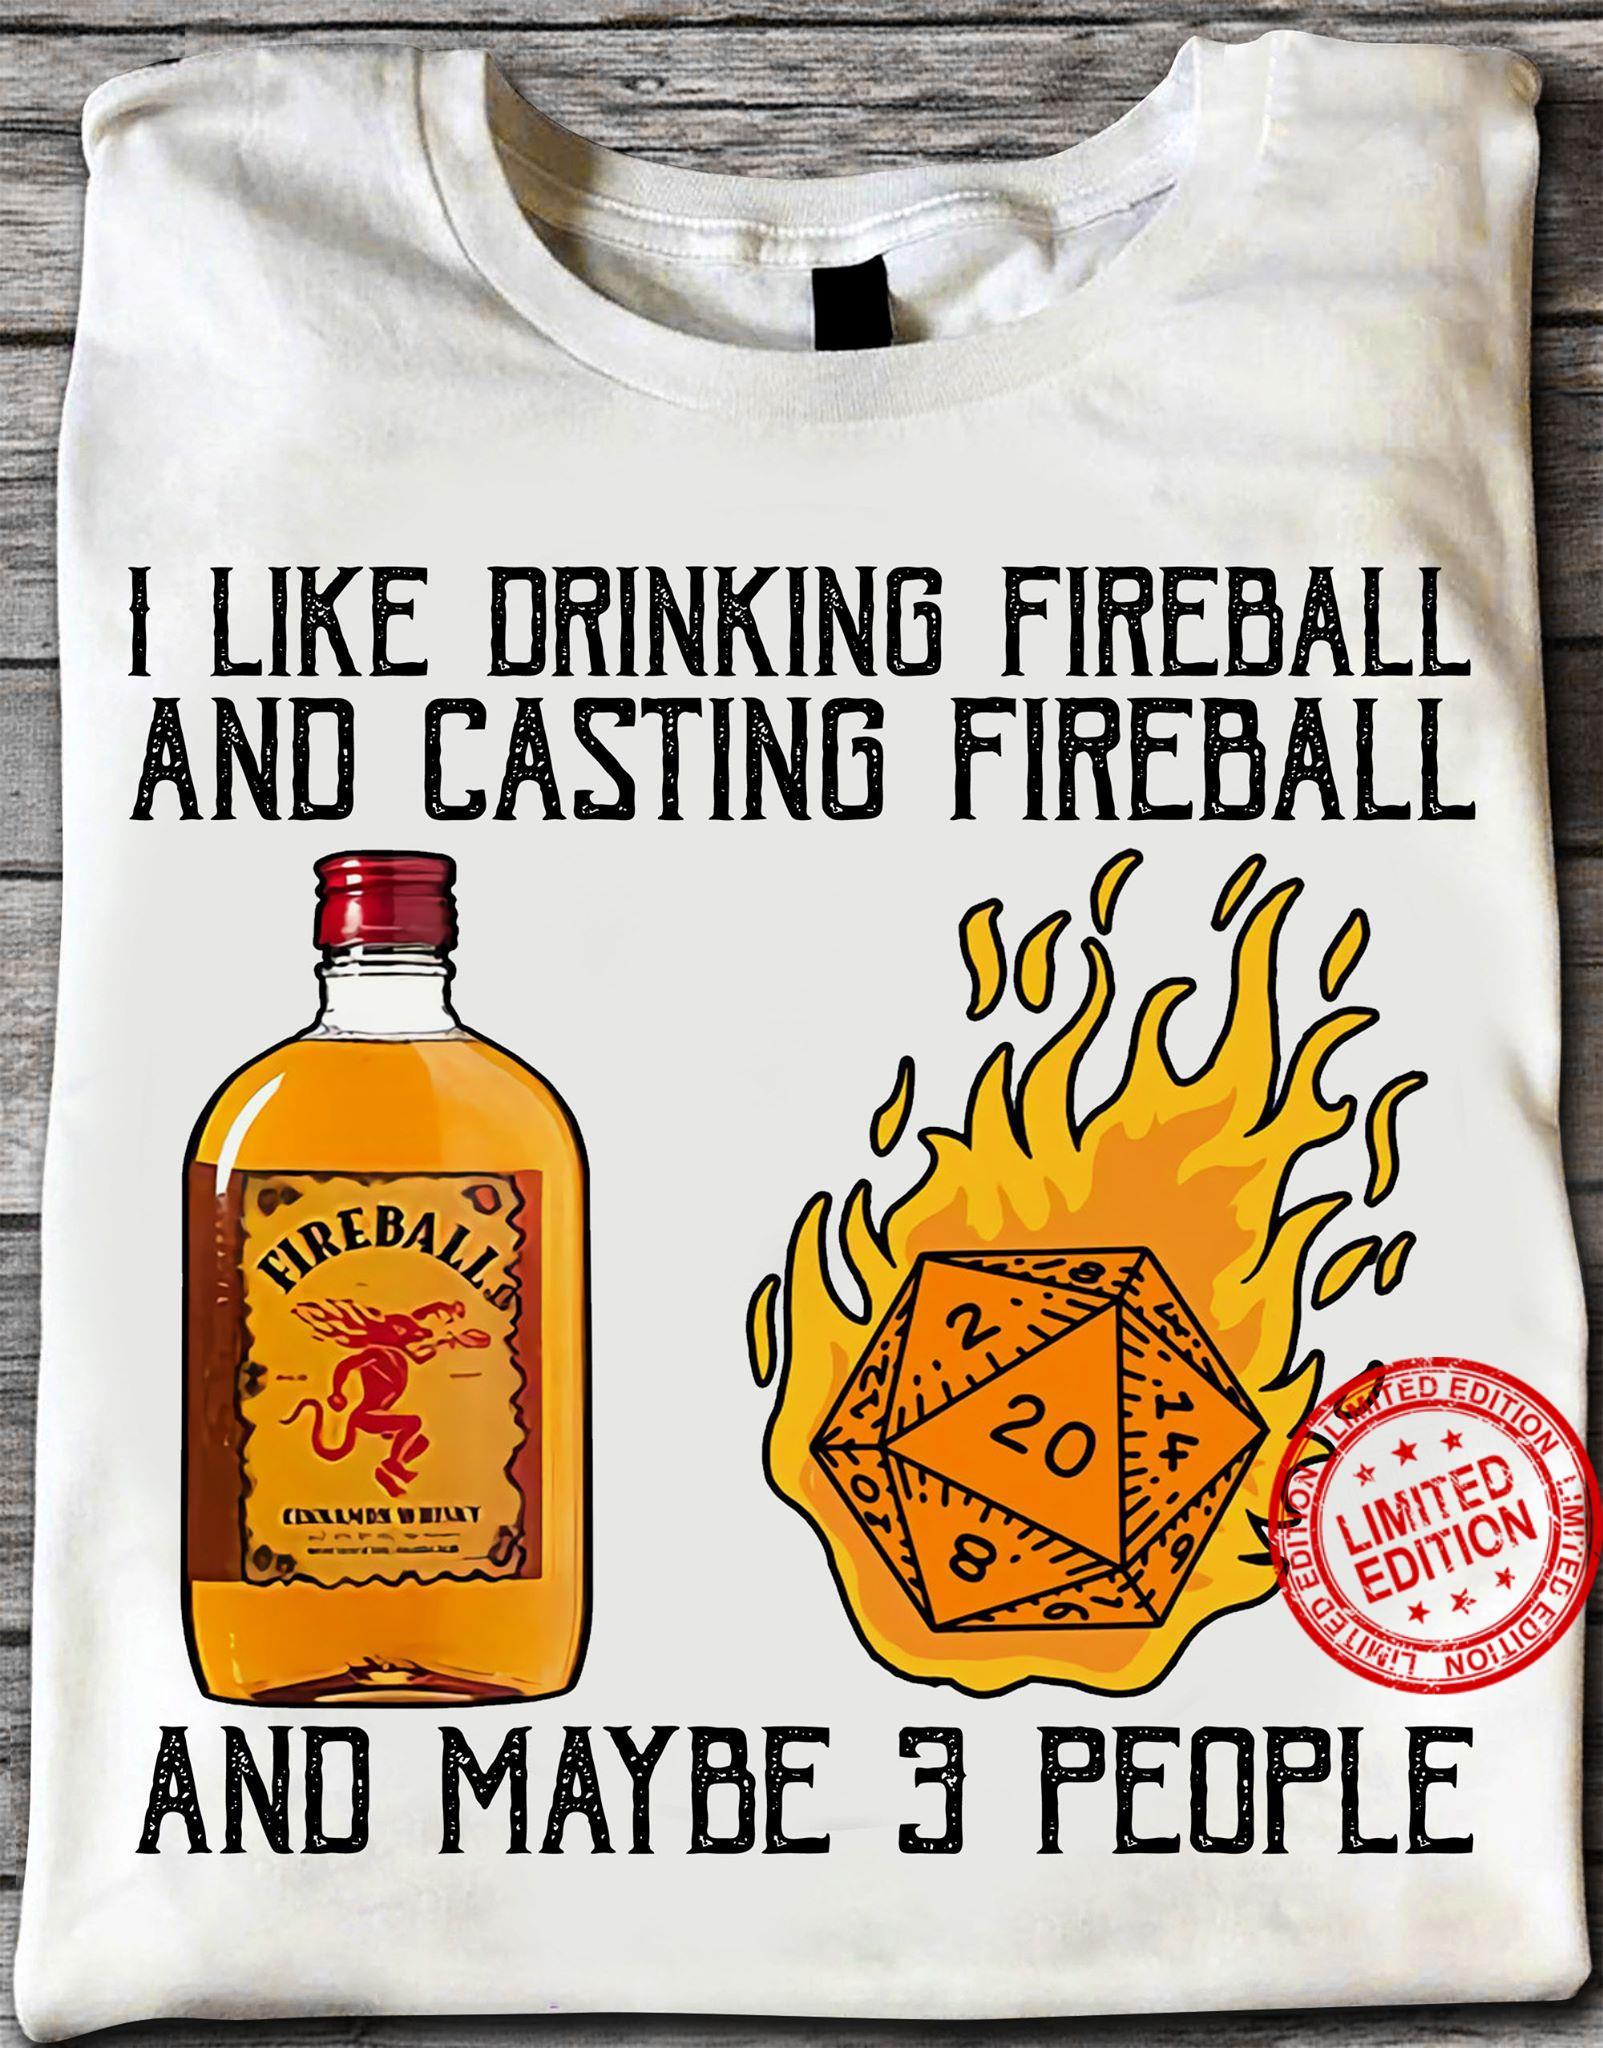 I Like Drinking Fireball And Casting Fireball And Maybe 3 People Shirt